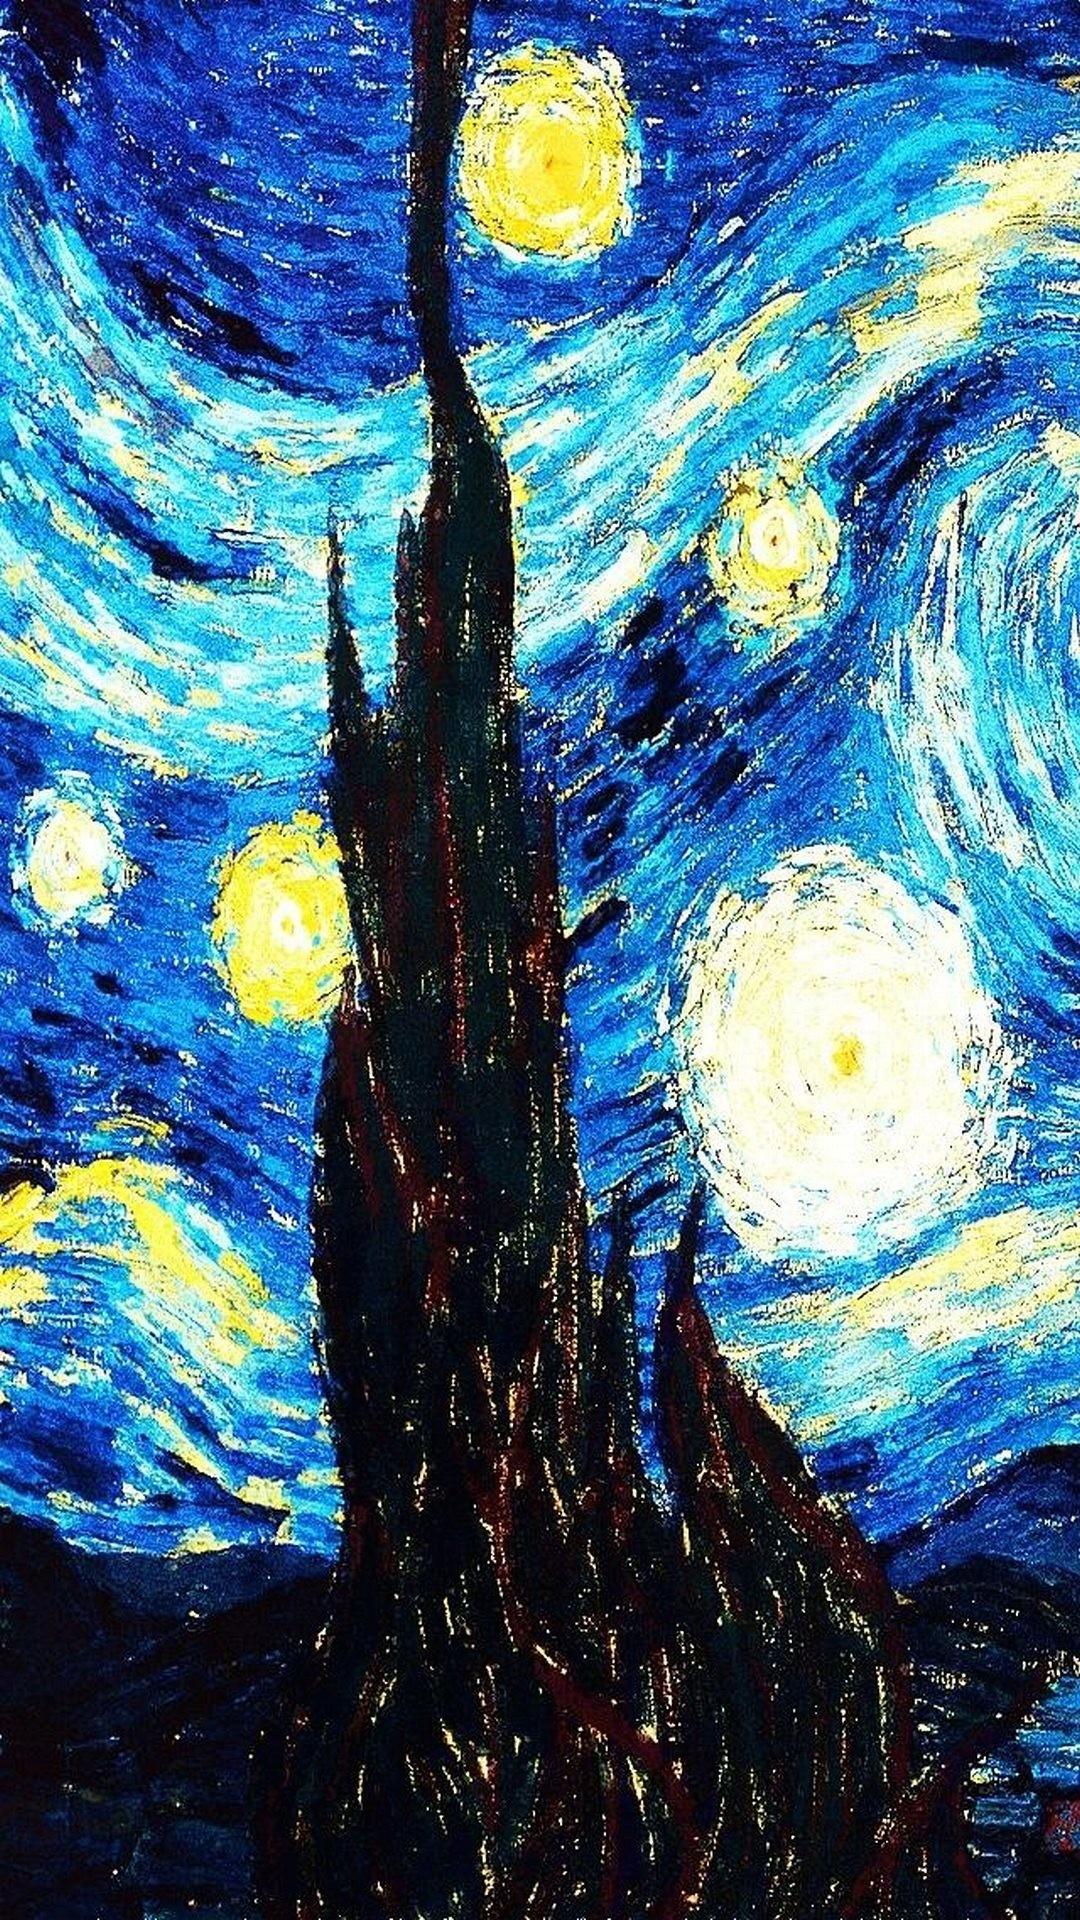 Van Gogh Starry Night Iphone Wallpaper Starry Night Wallpaper 70 Images